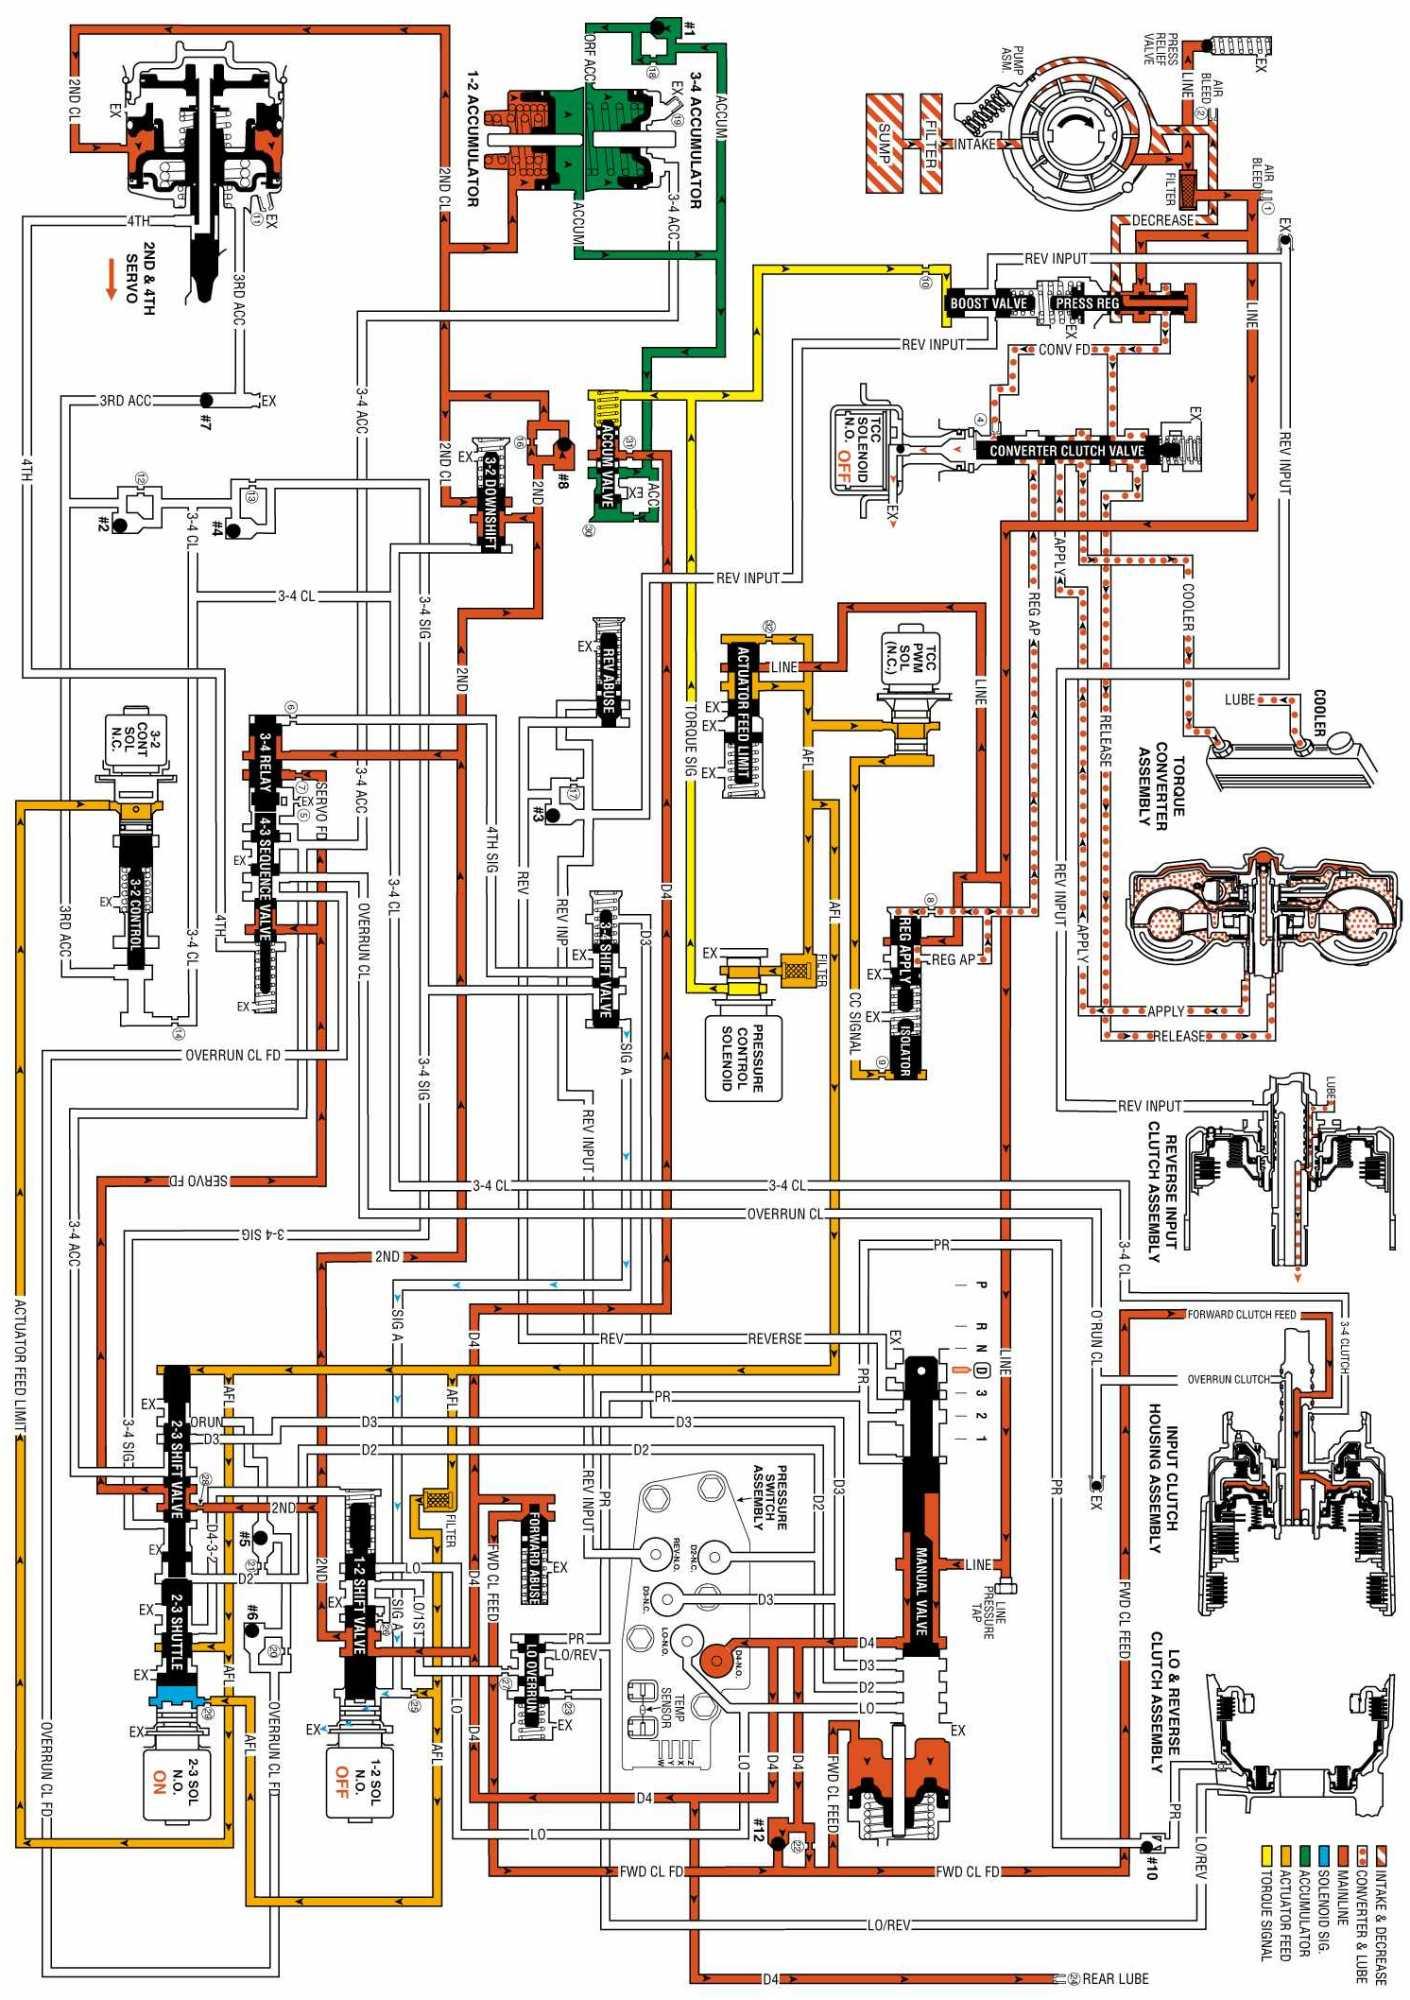 hight resolution of 4l60e 700r4 things i ve learned blazer forum chevy blazer forums chevy reverse servo diagram